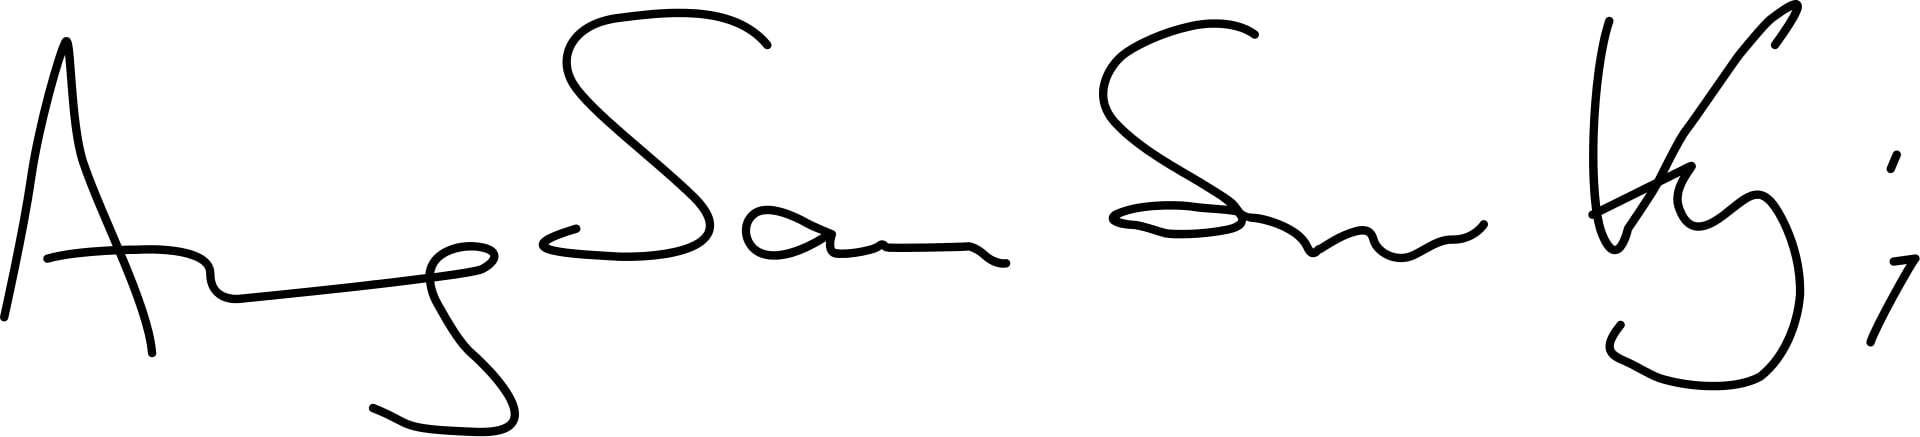 Aung San Suu Kyi Signature